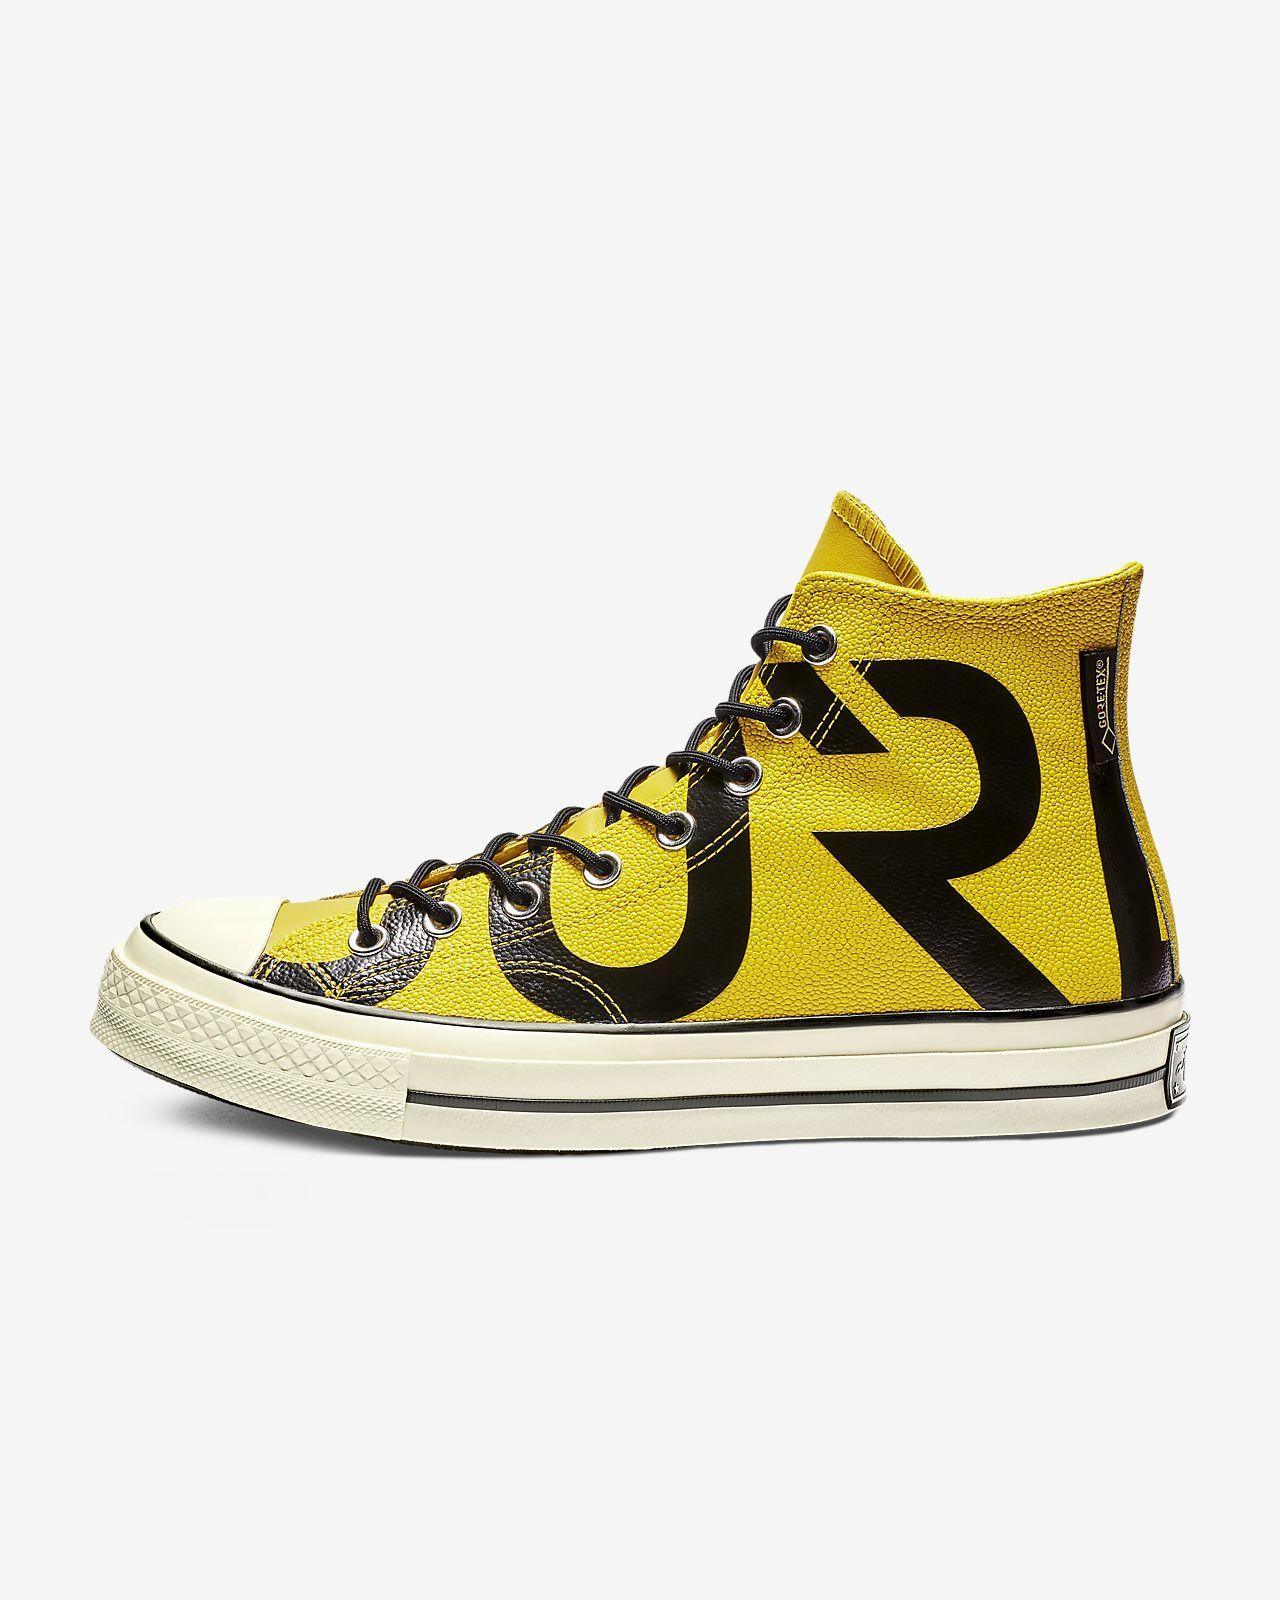 fdbca4f03b Converse Chuck 70 GORE-TEX Leather High Top Unisex Shoe